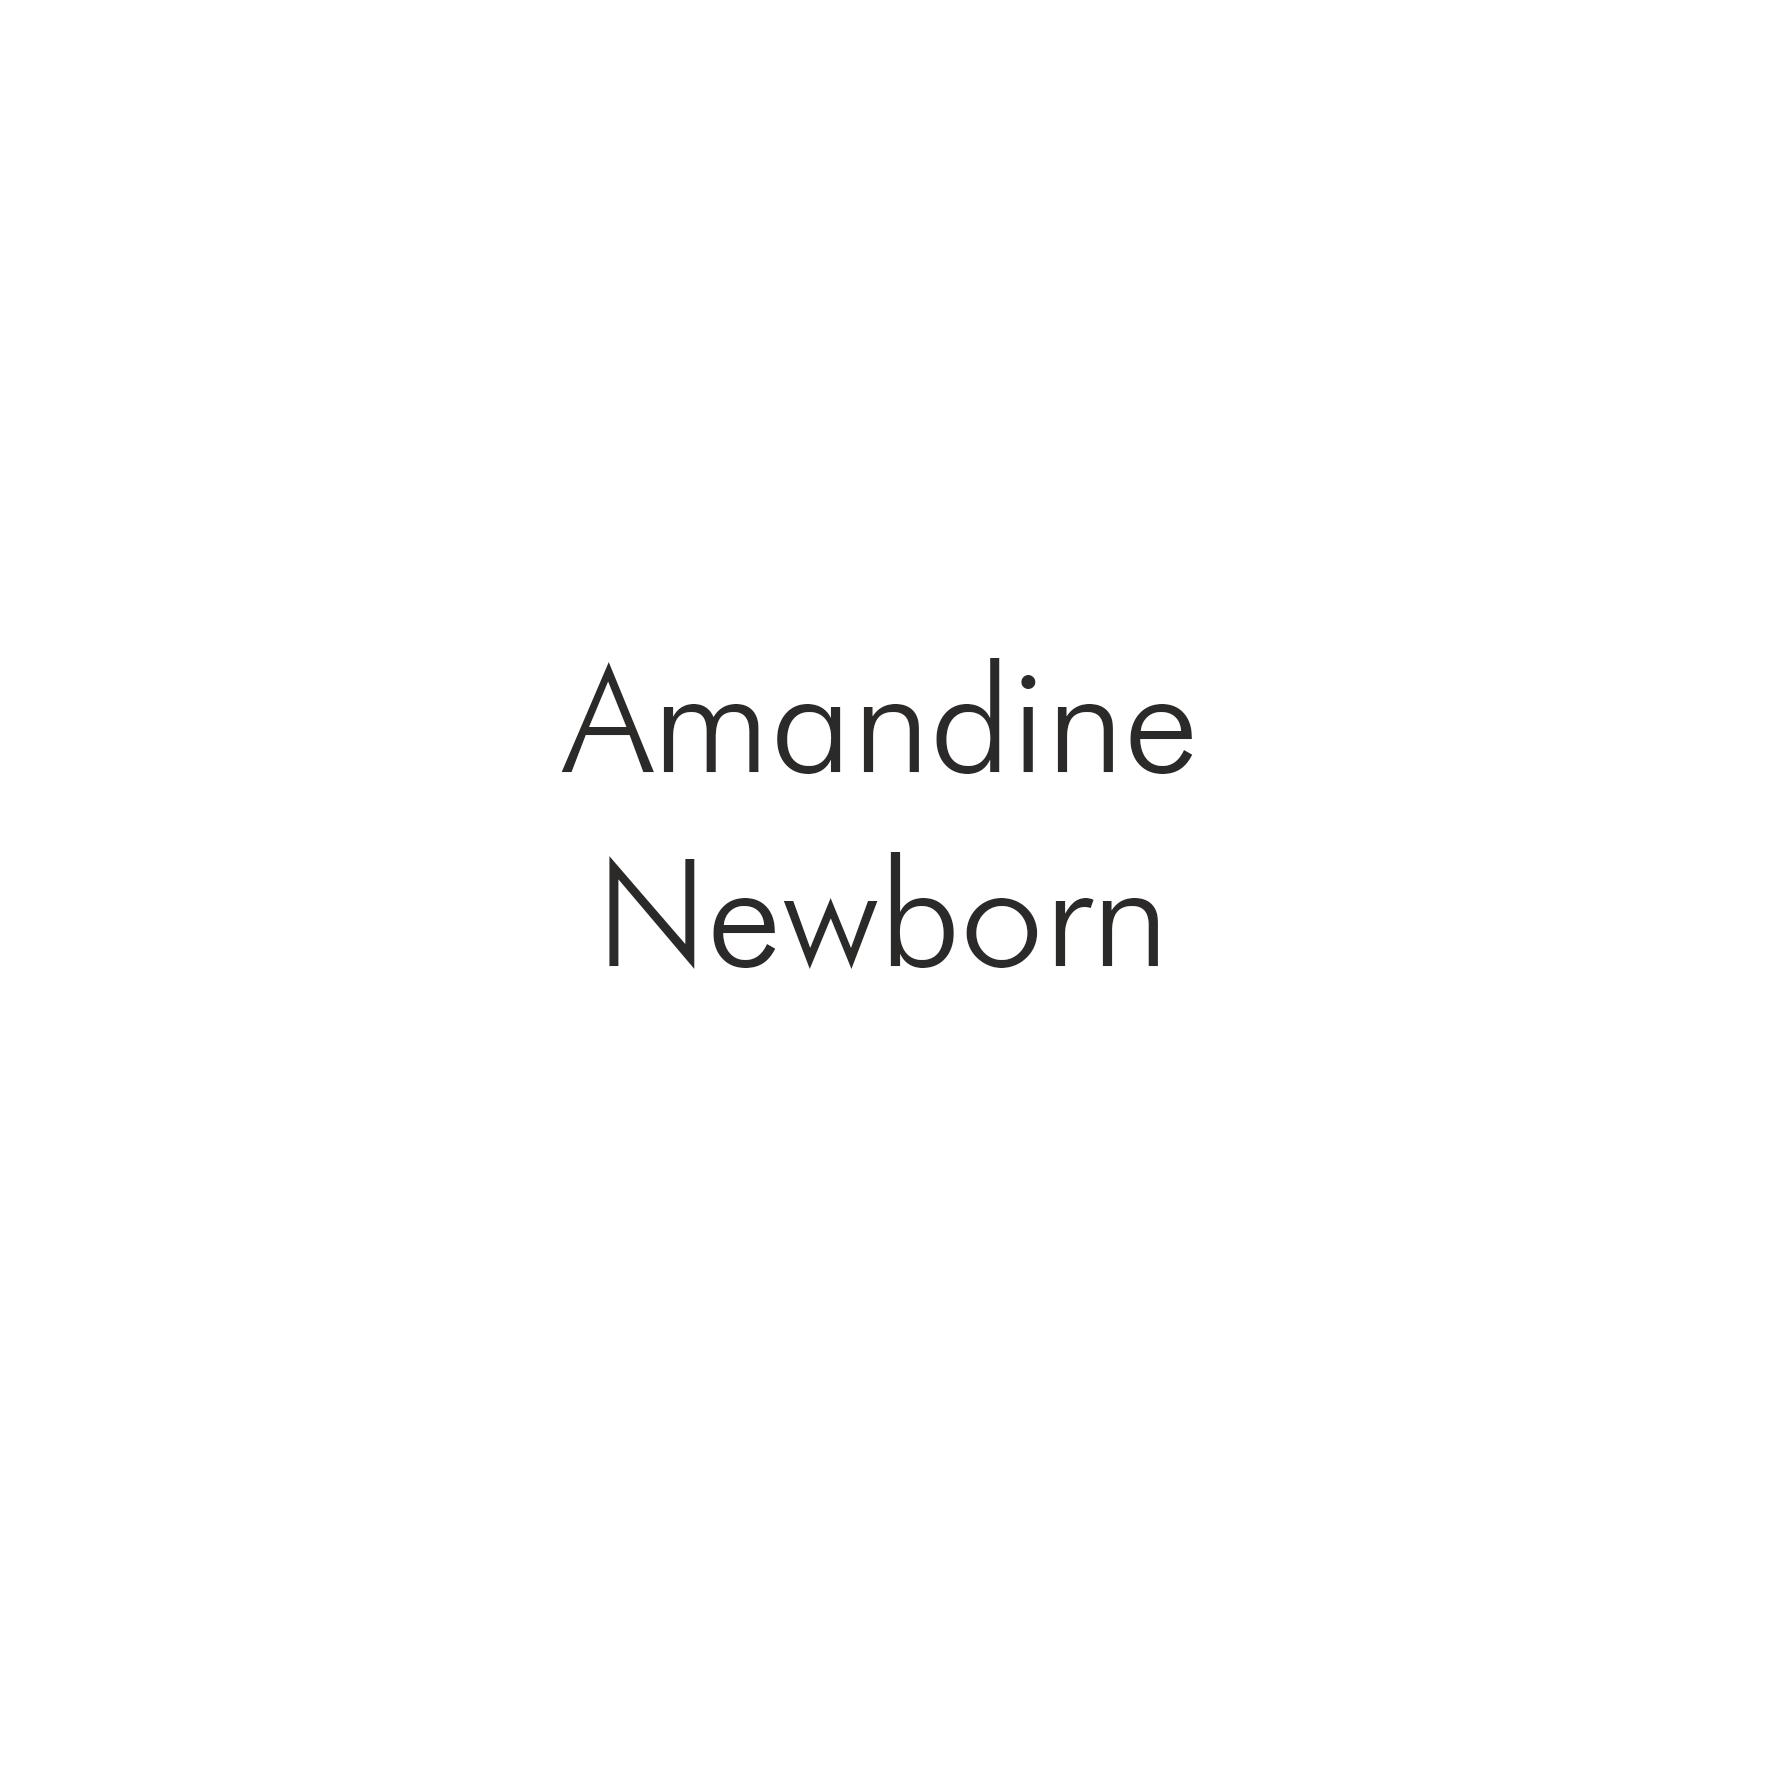 Amandine Newborn.png